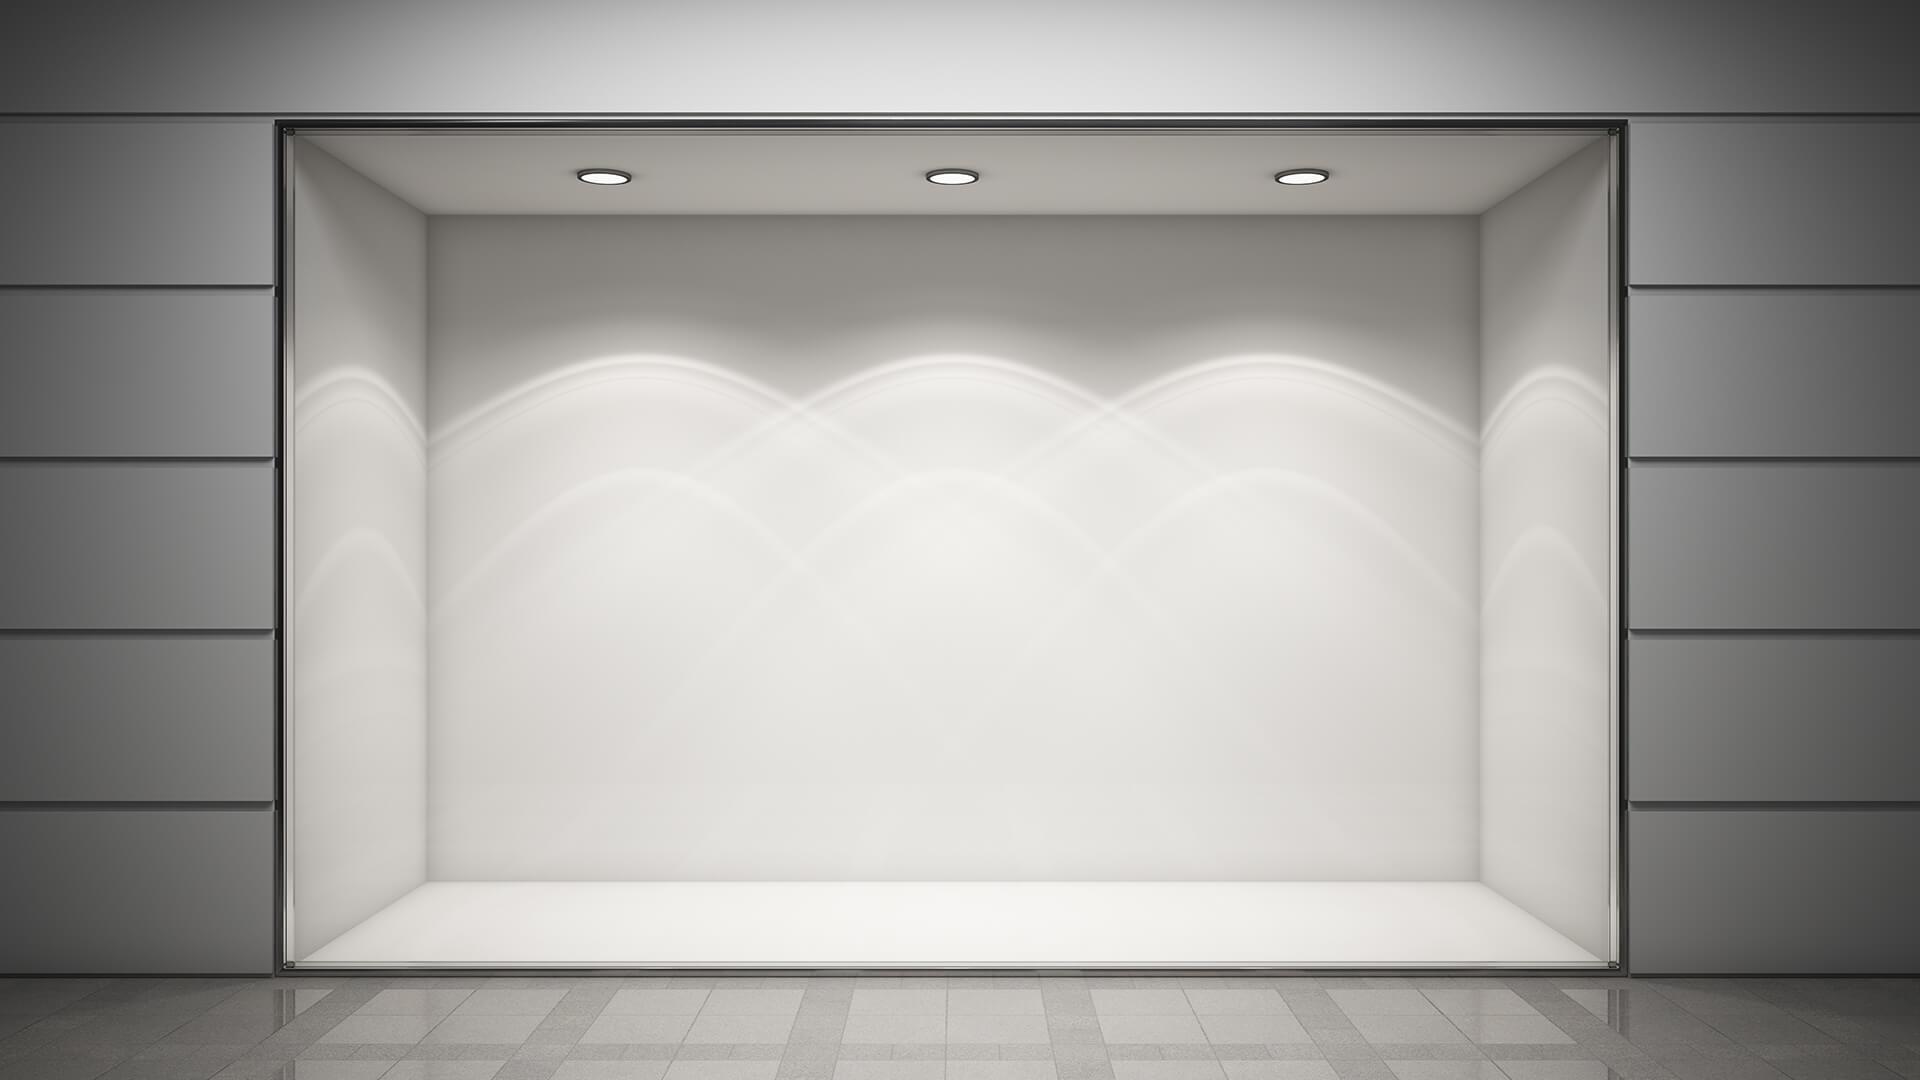 vitrin cam tamiri - Vitrin Camı Tamiri